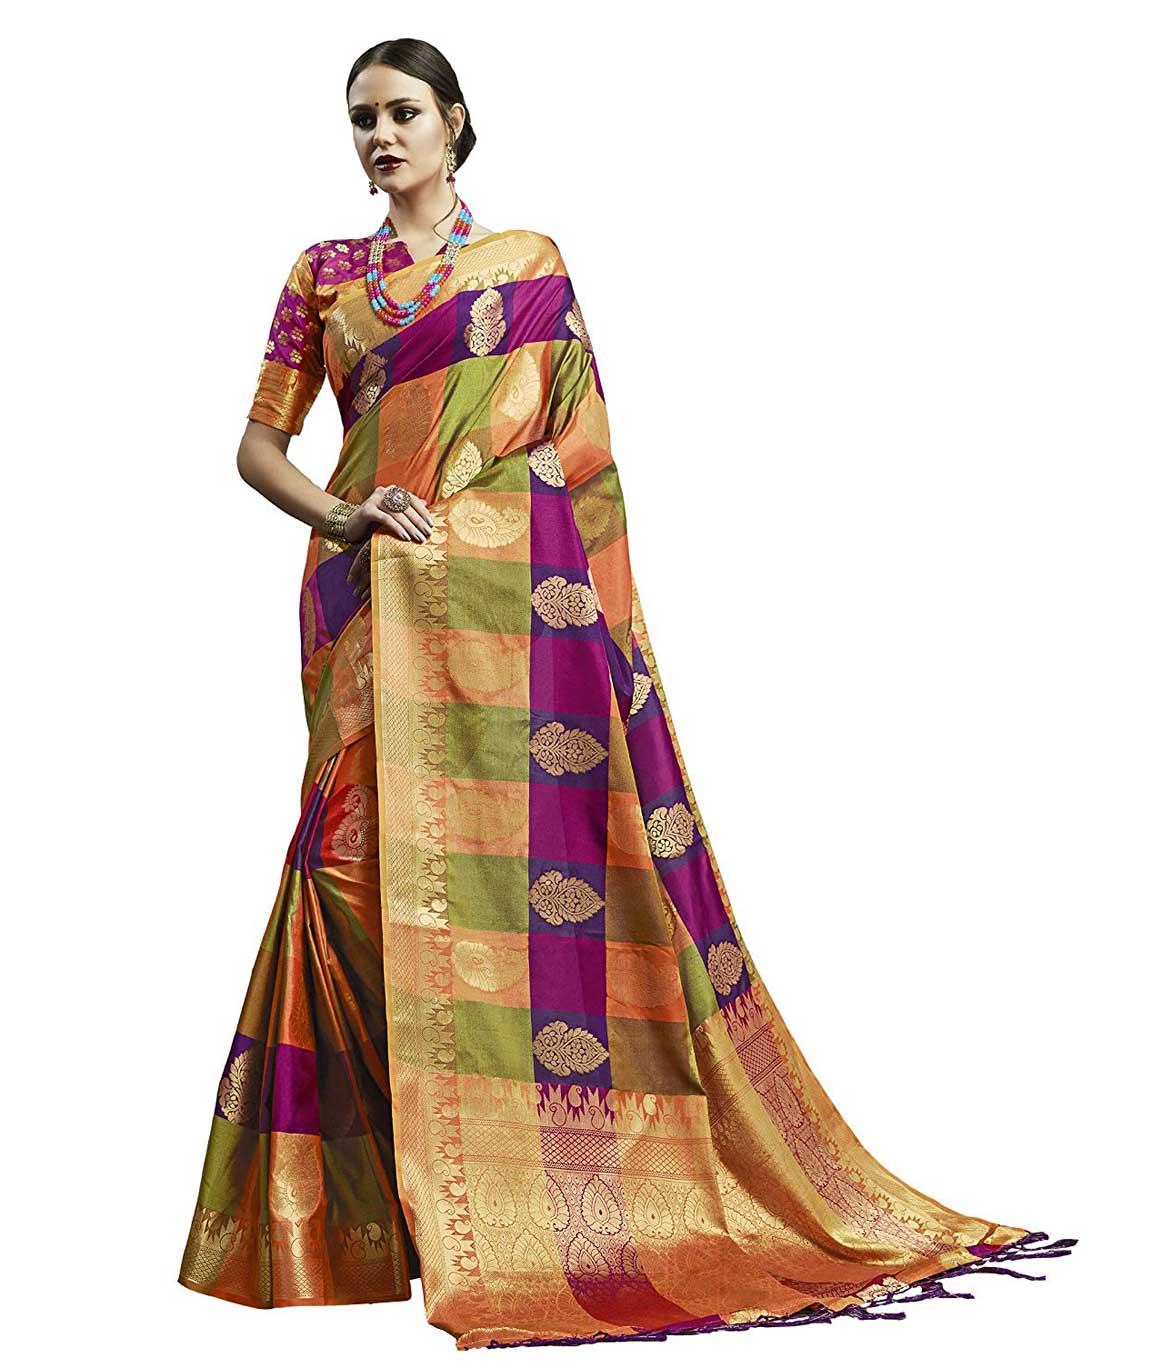 Shangrila Designer Heavy Zari Border Banarasi Silk Saree with Unstitched Blouse Piece